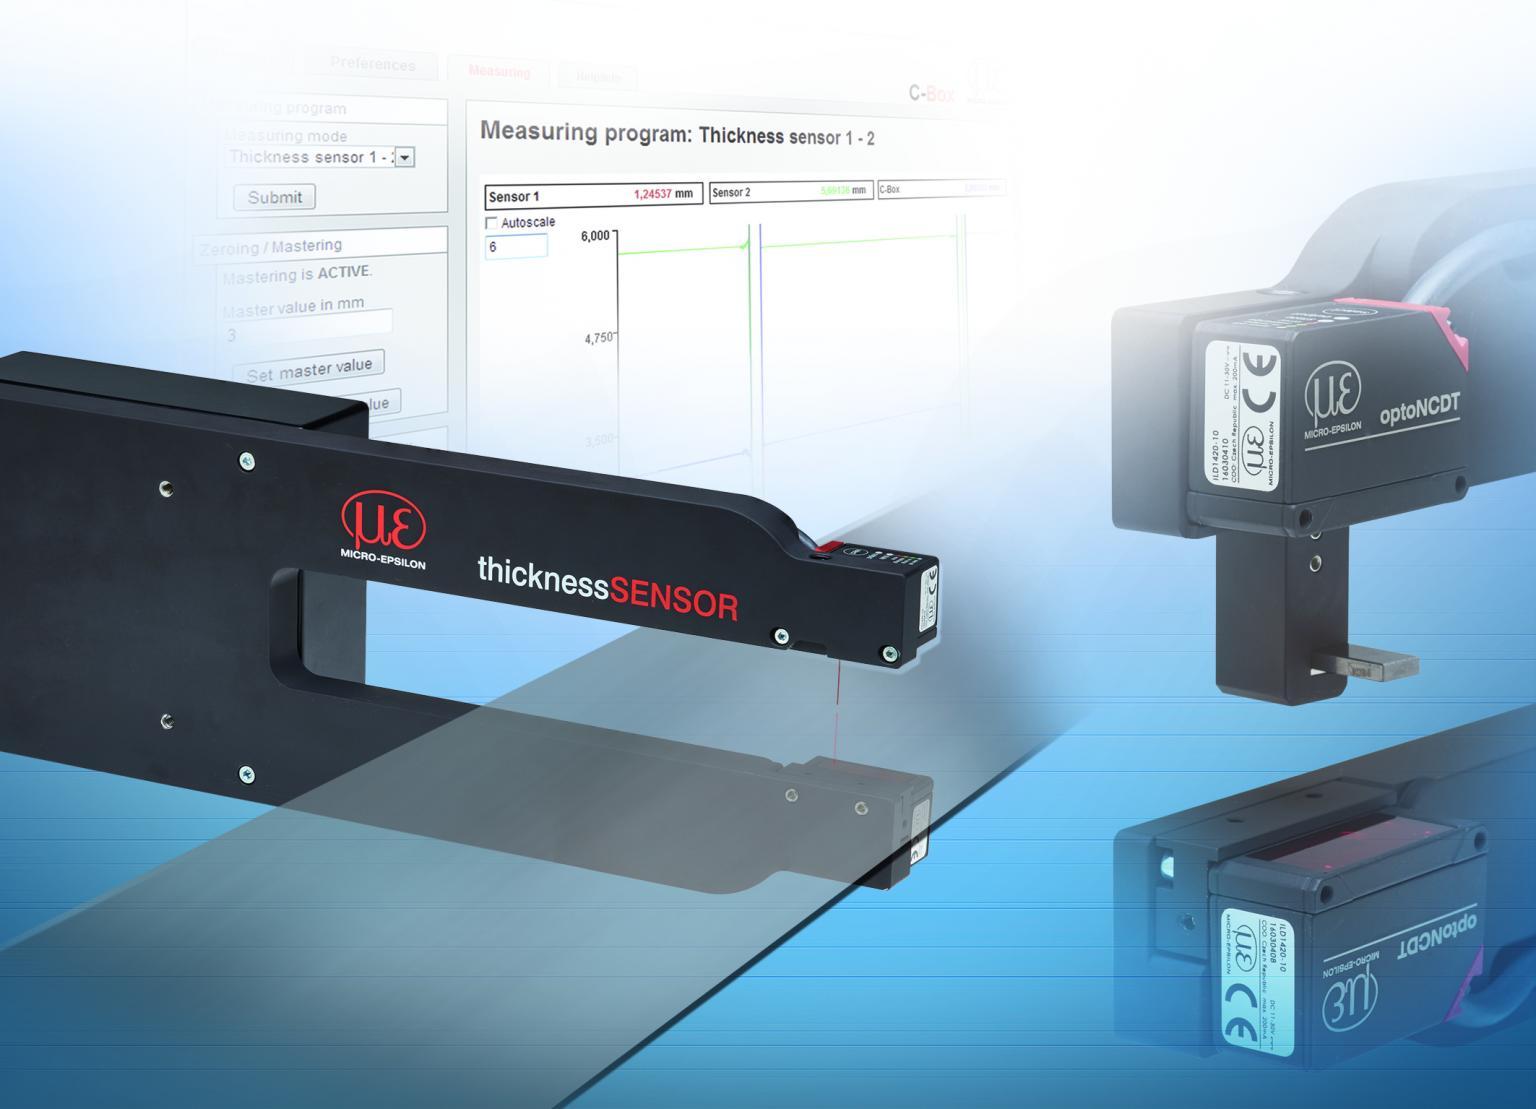 The ThicknessSensor is Micro-Epsilon's latest measuring solution